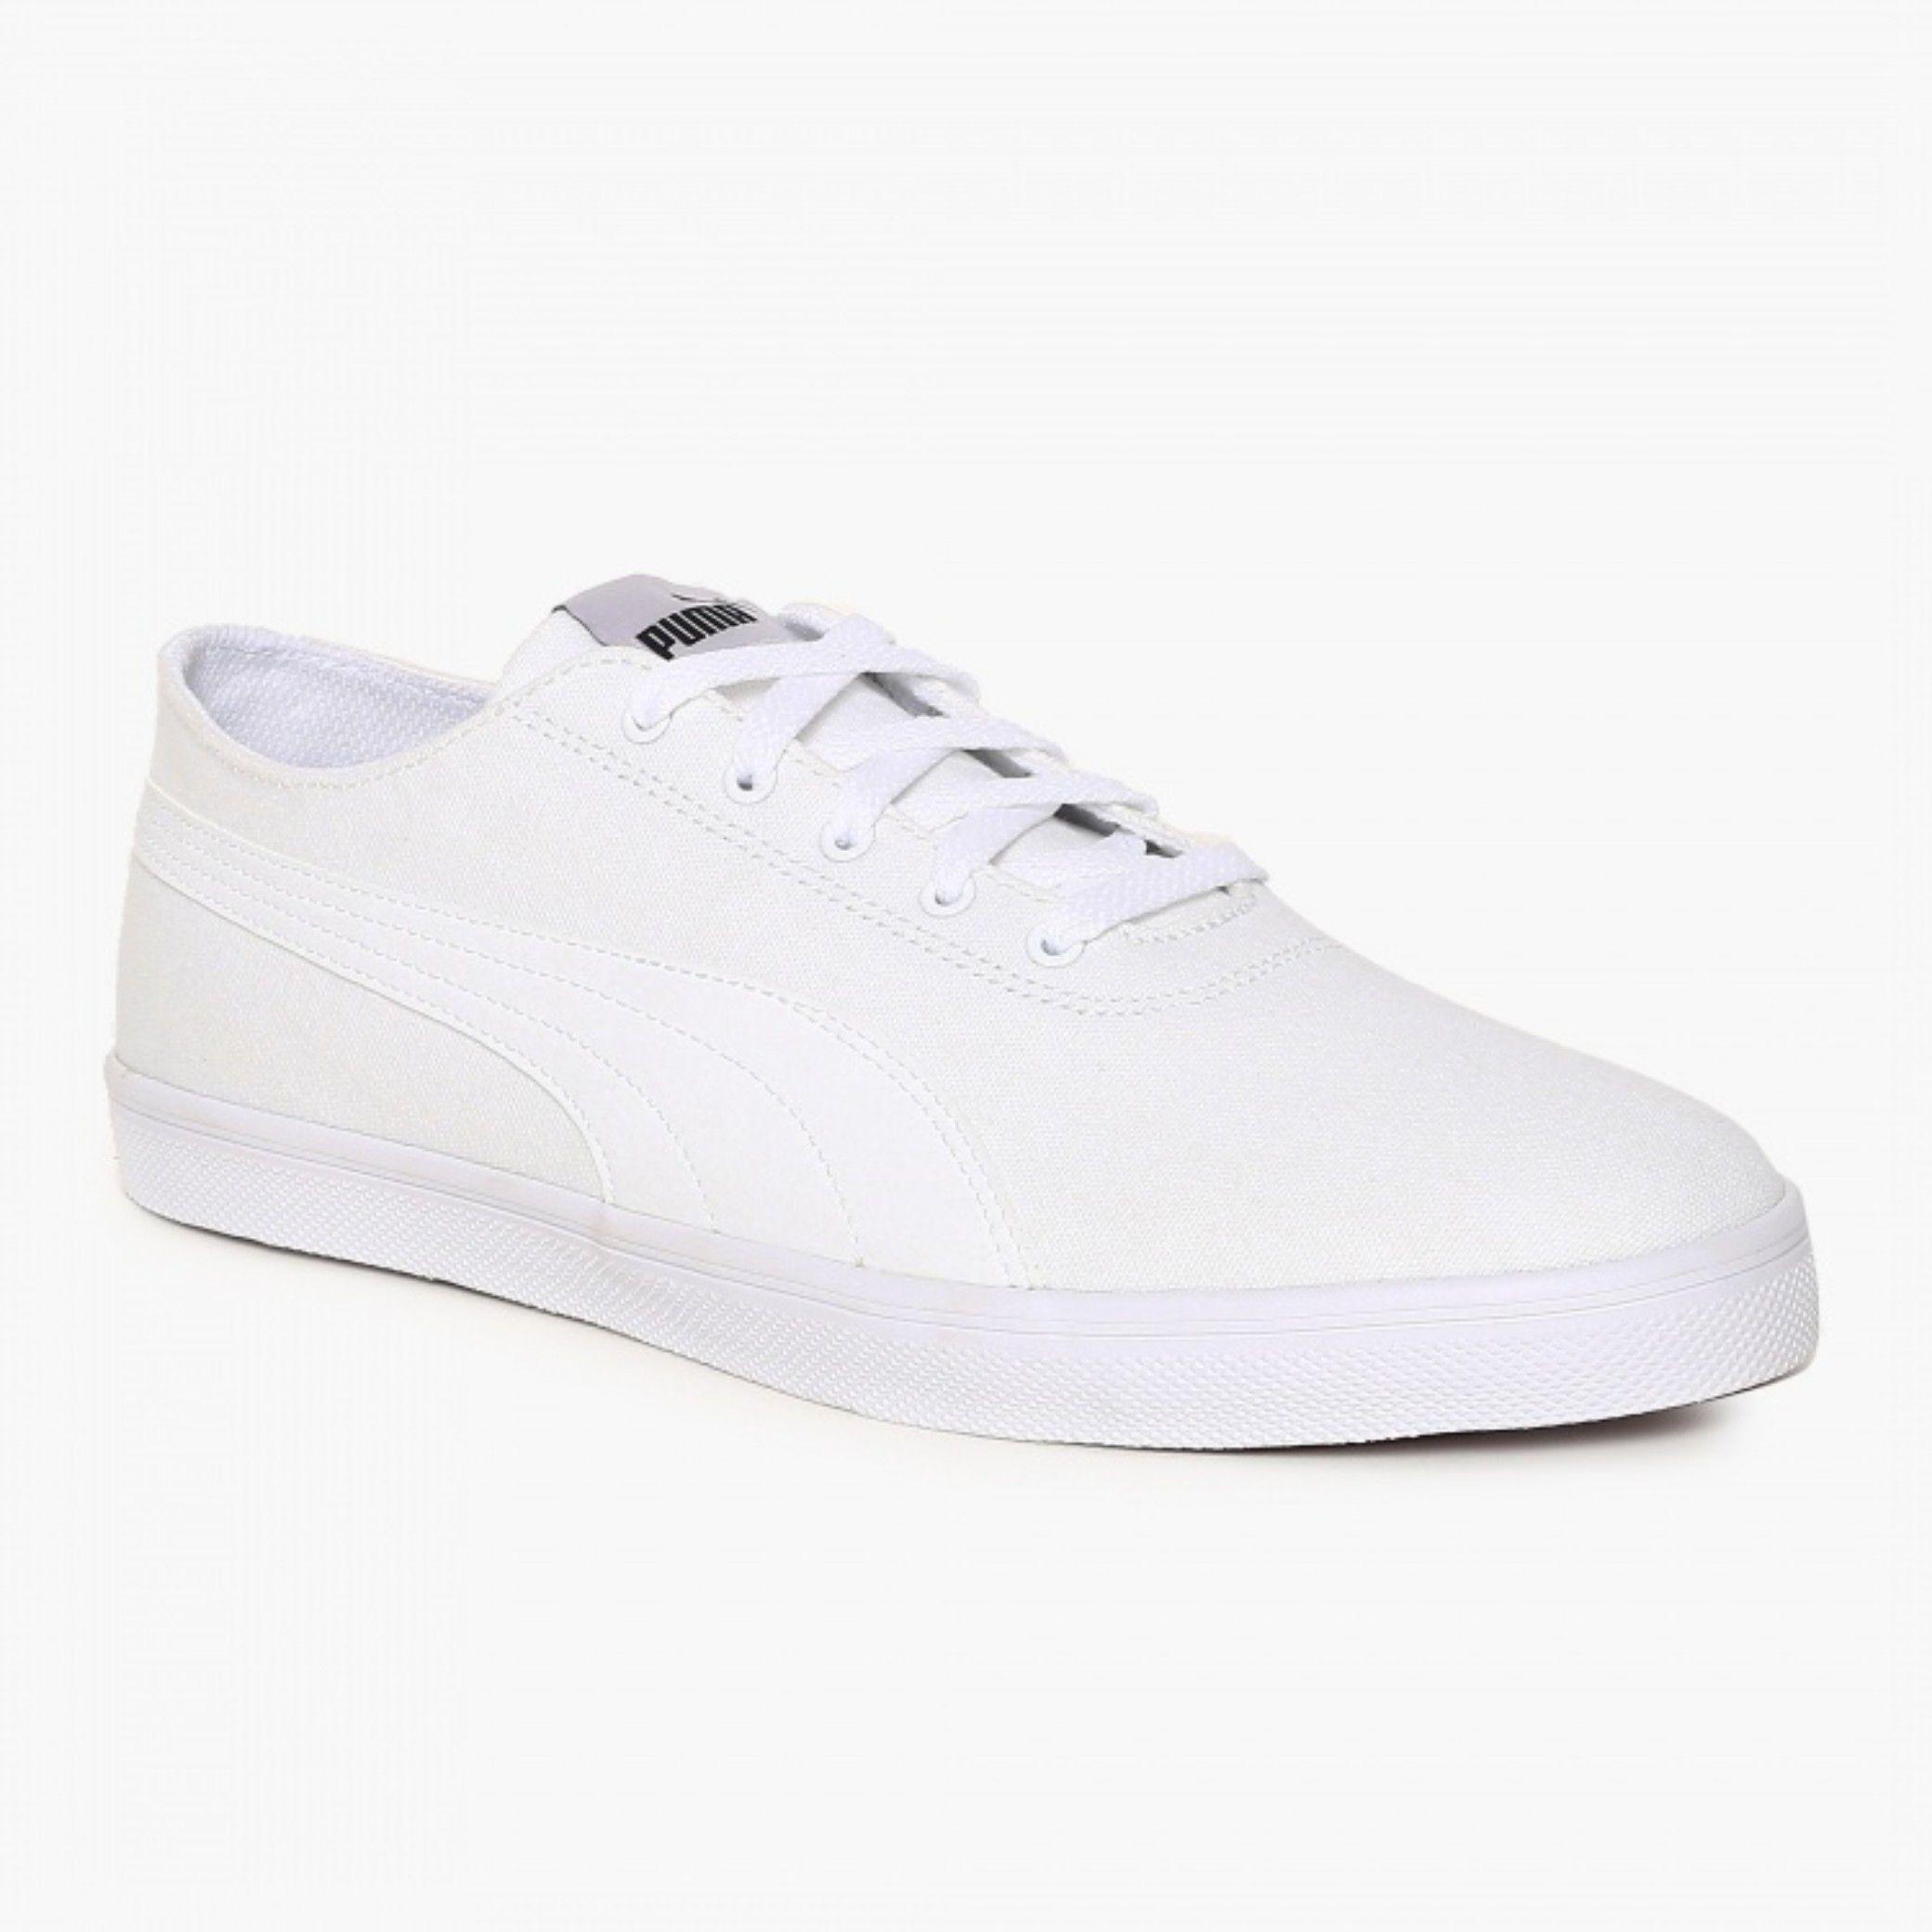 f2662f54d6c0 Puma Urban Sneakers White Casual Shoes - Buy Puma Urban Sneakers ...